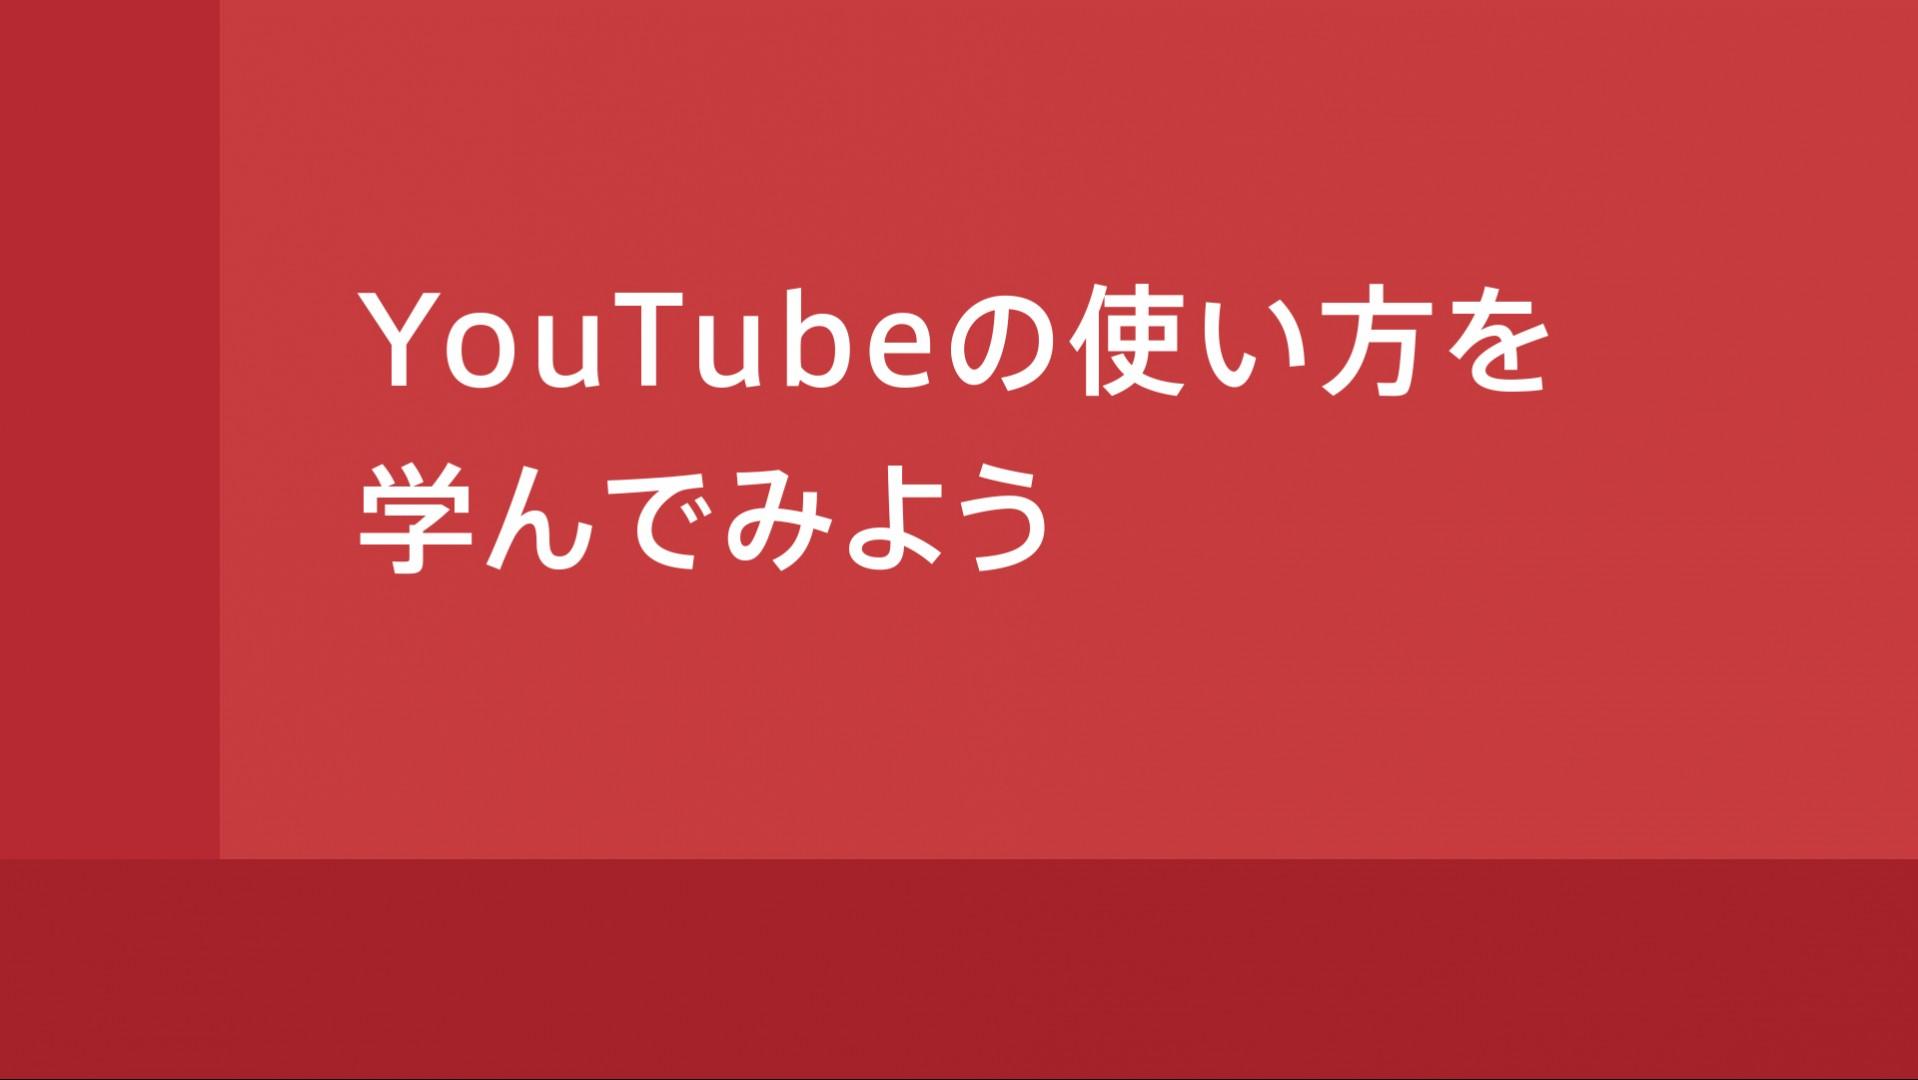 Youtube 使い方 再生リストを作成する